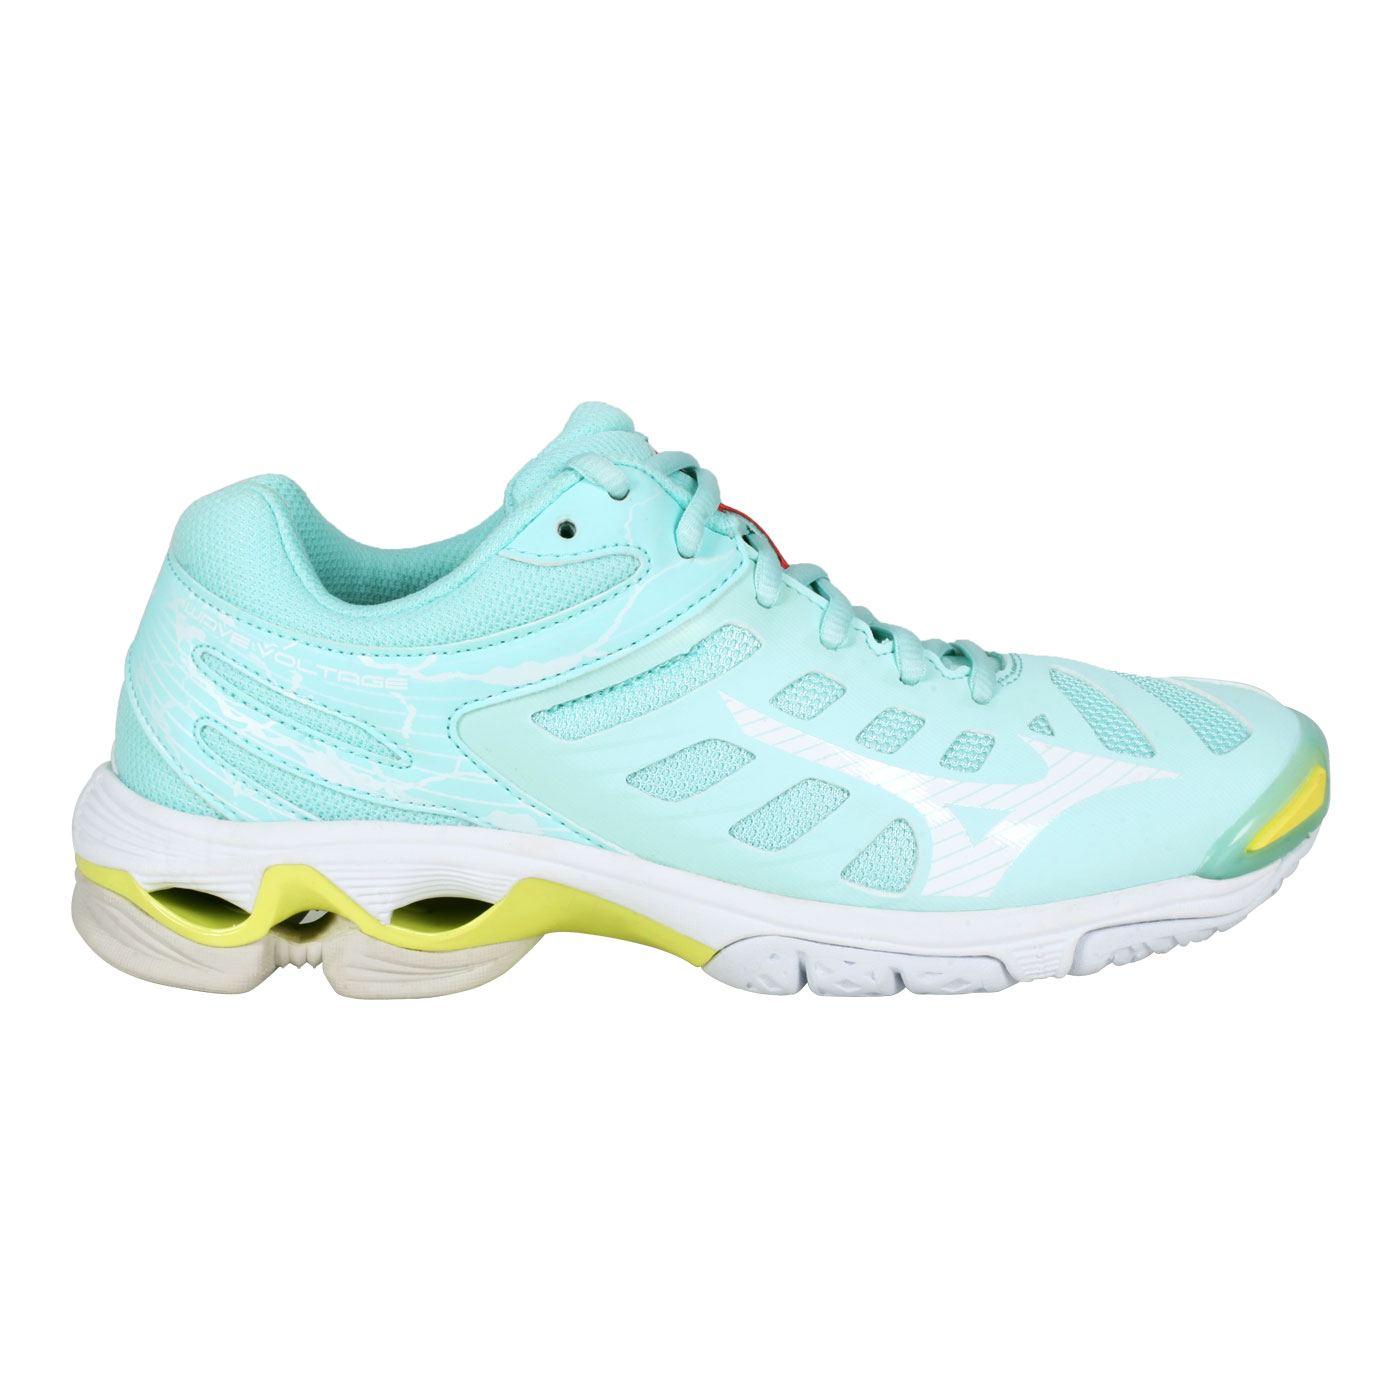 MIZUNO 女款排球鞋  @WAVE VOLTAGE@V1GC216026 - 淺藍白黃